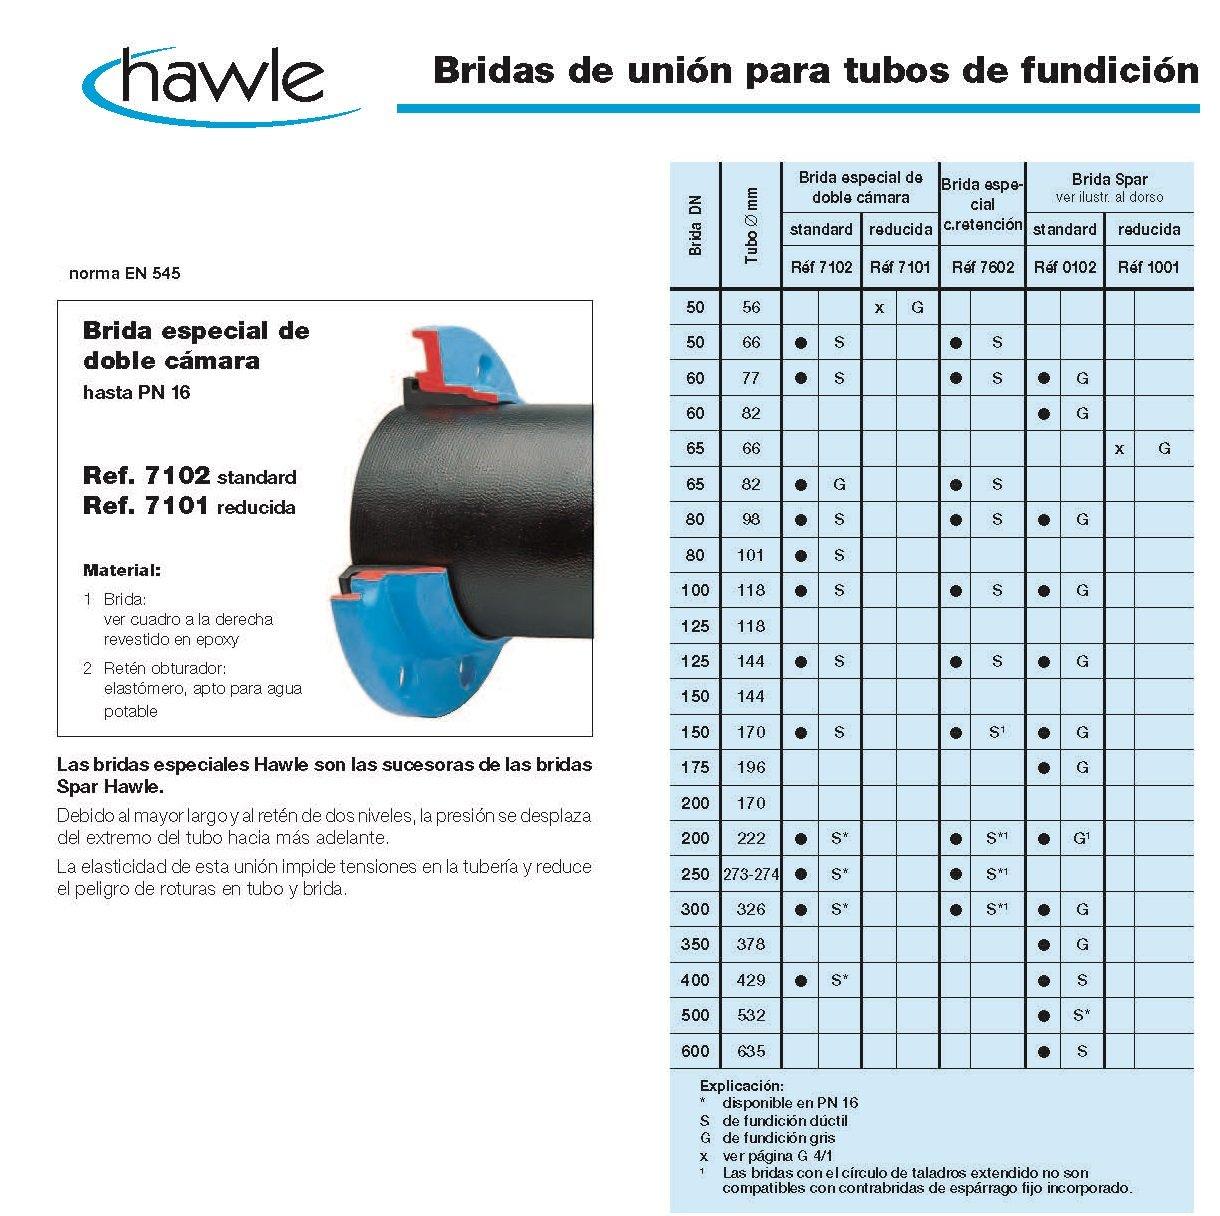 bridas de union para tubos de fundicion croquis